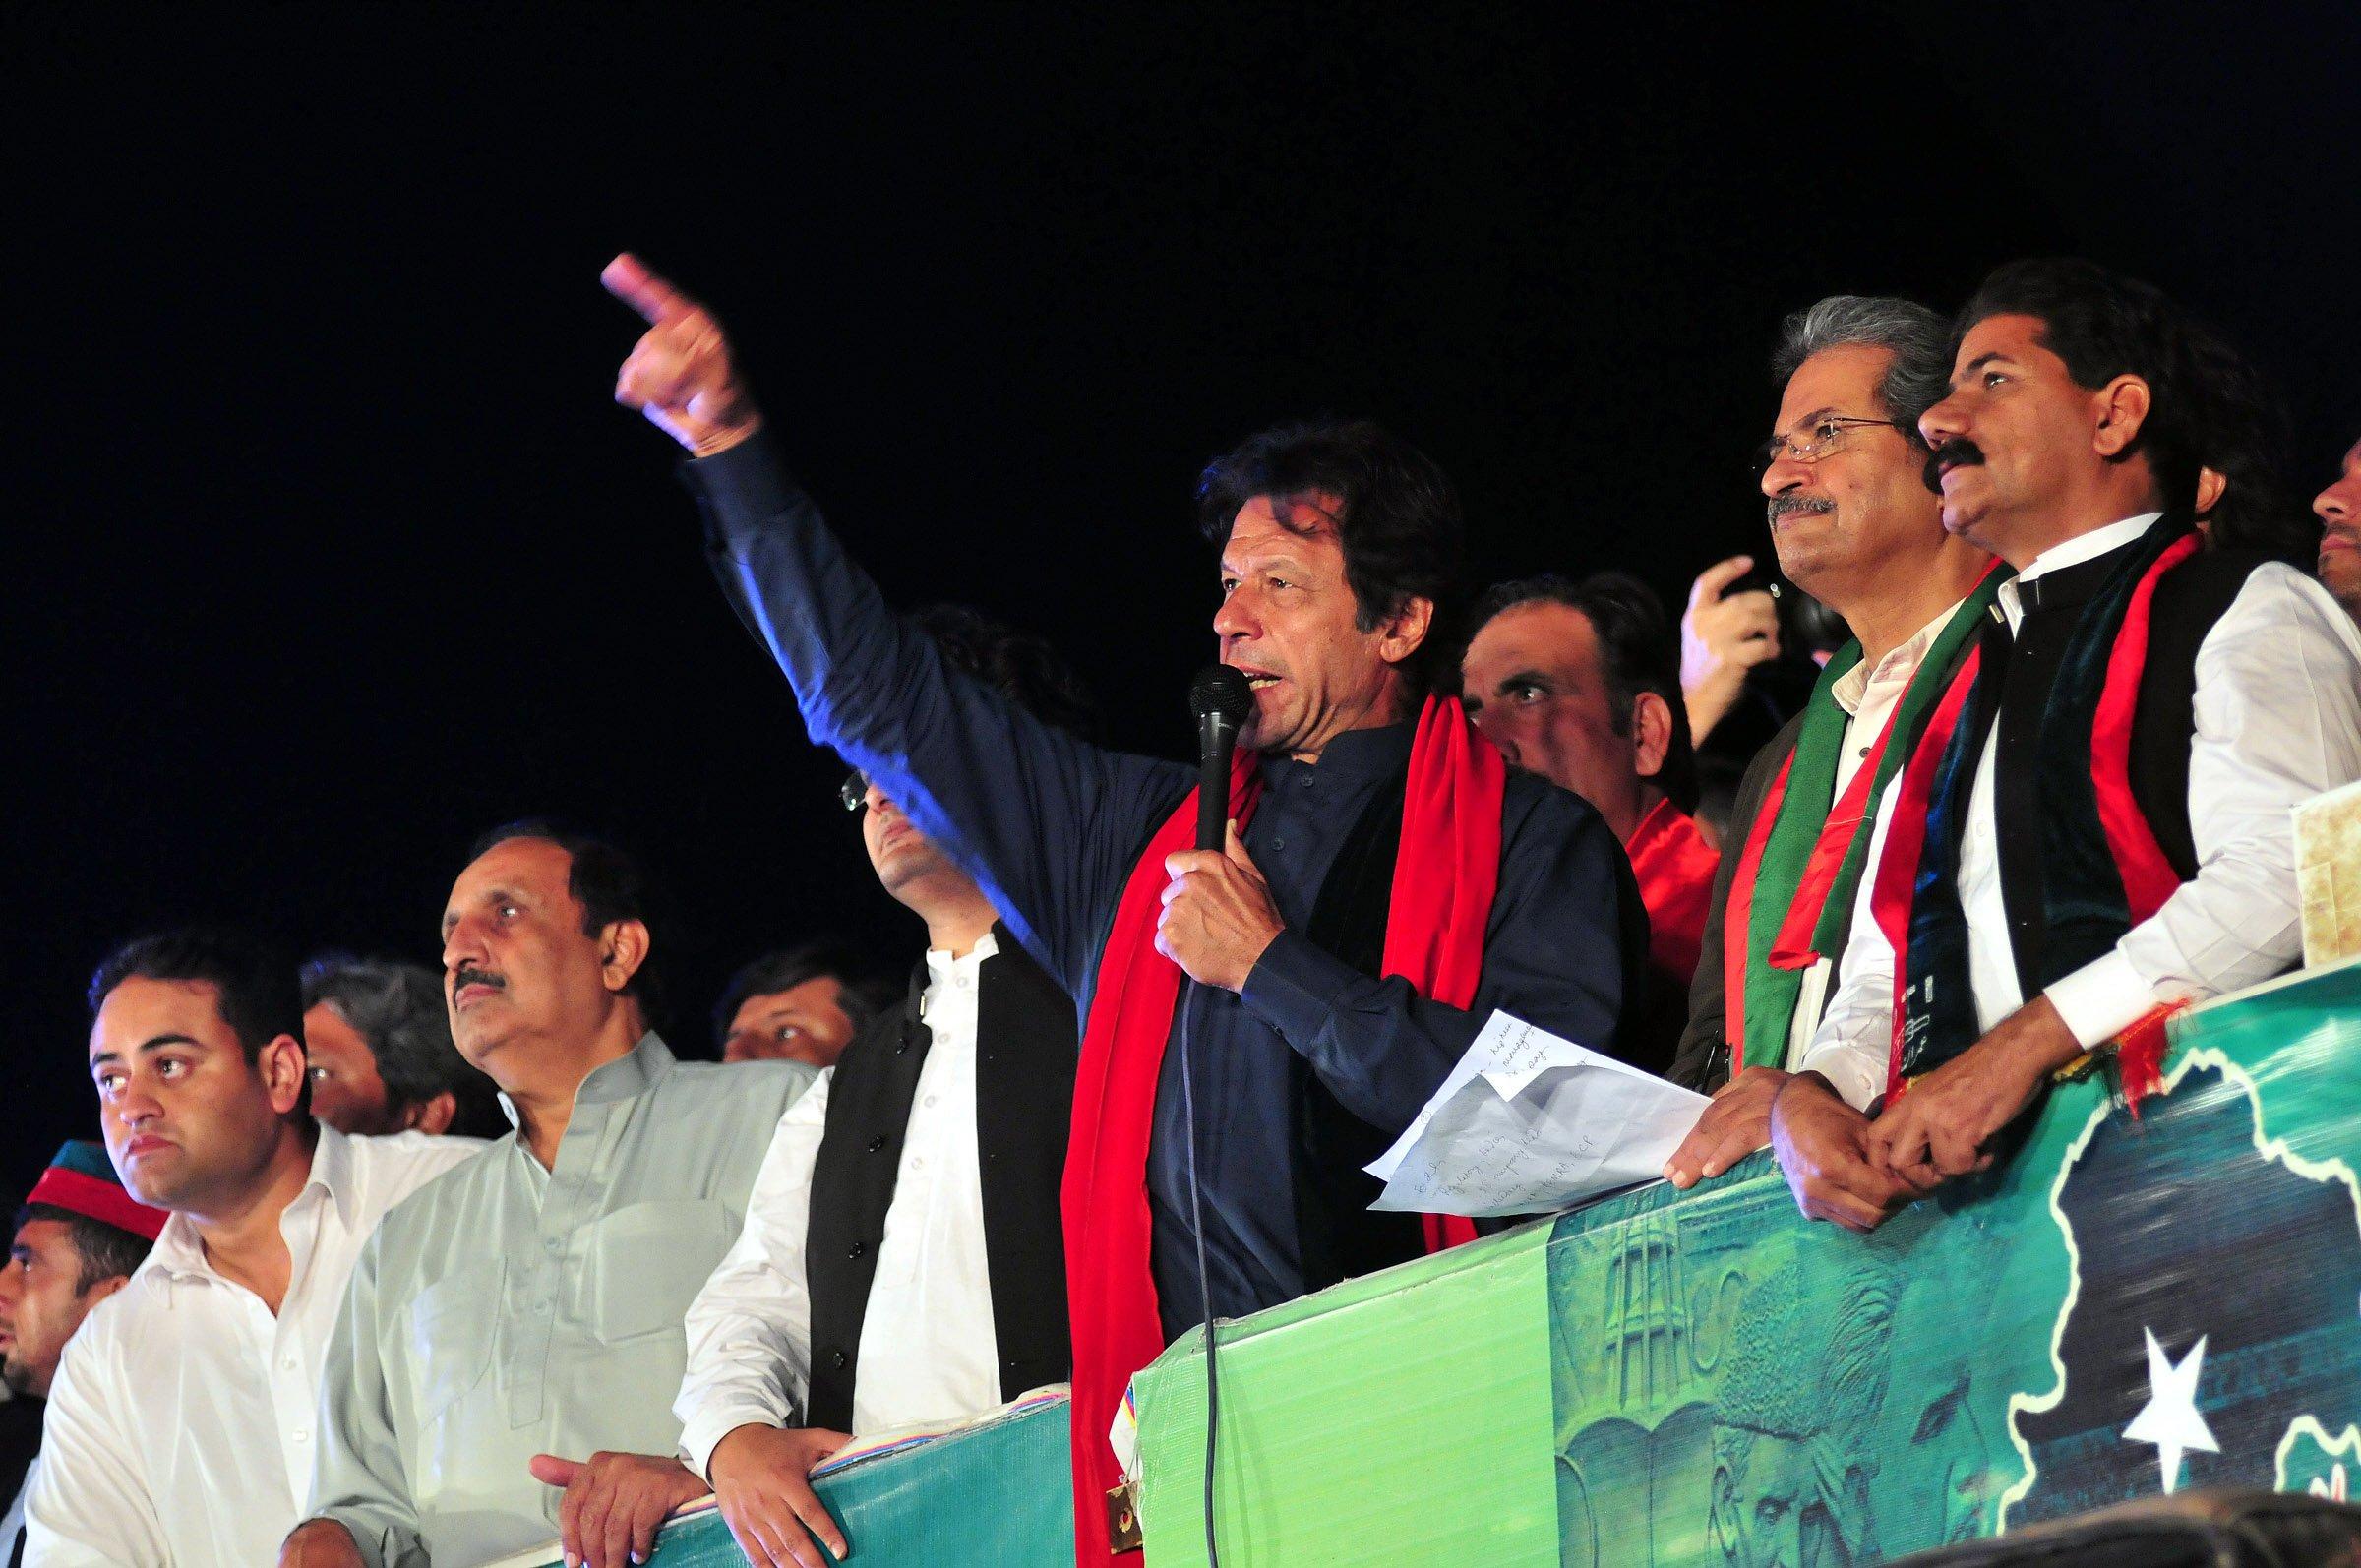 PTI Chairman Imran Khan addressing 'Azadi' March on Monday, October 20, 2014. PHOTO: EXPRESS/FILE